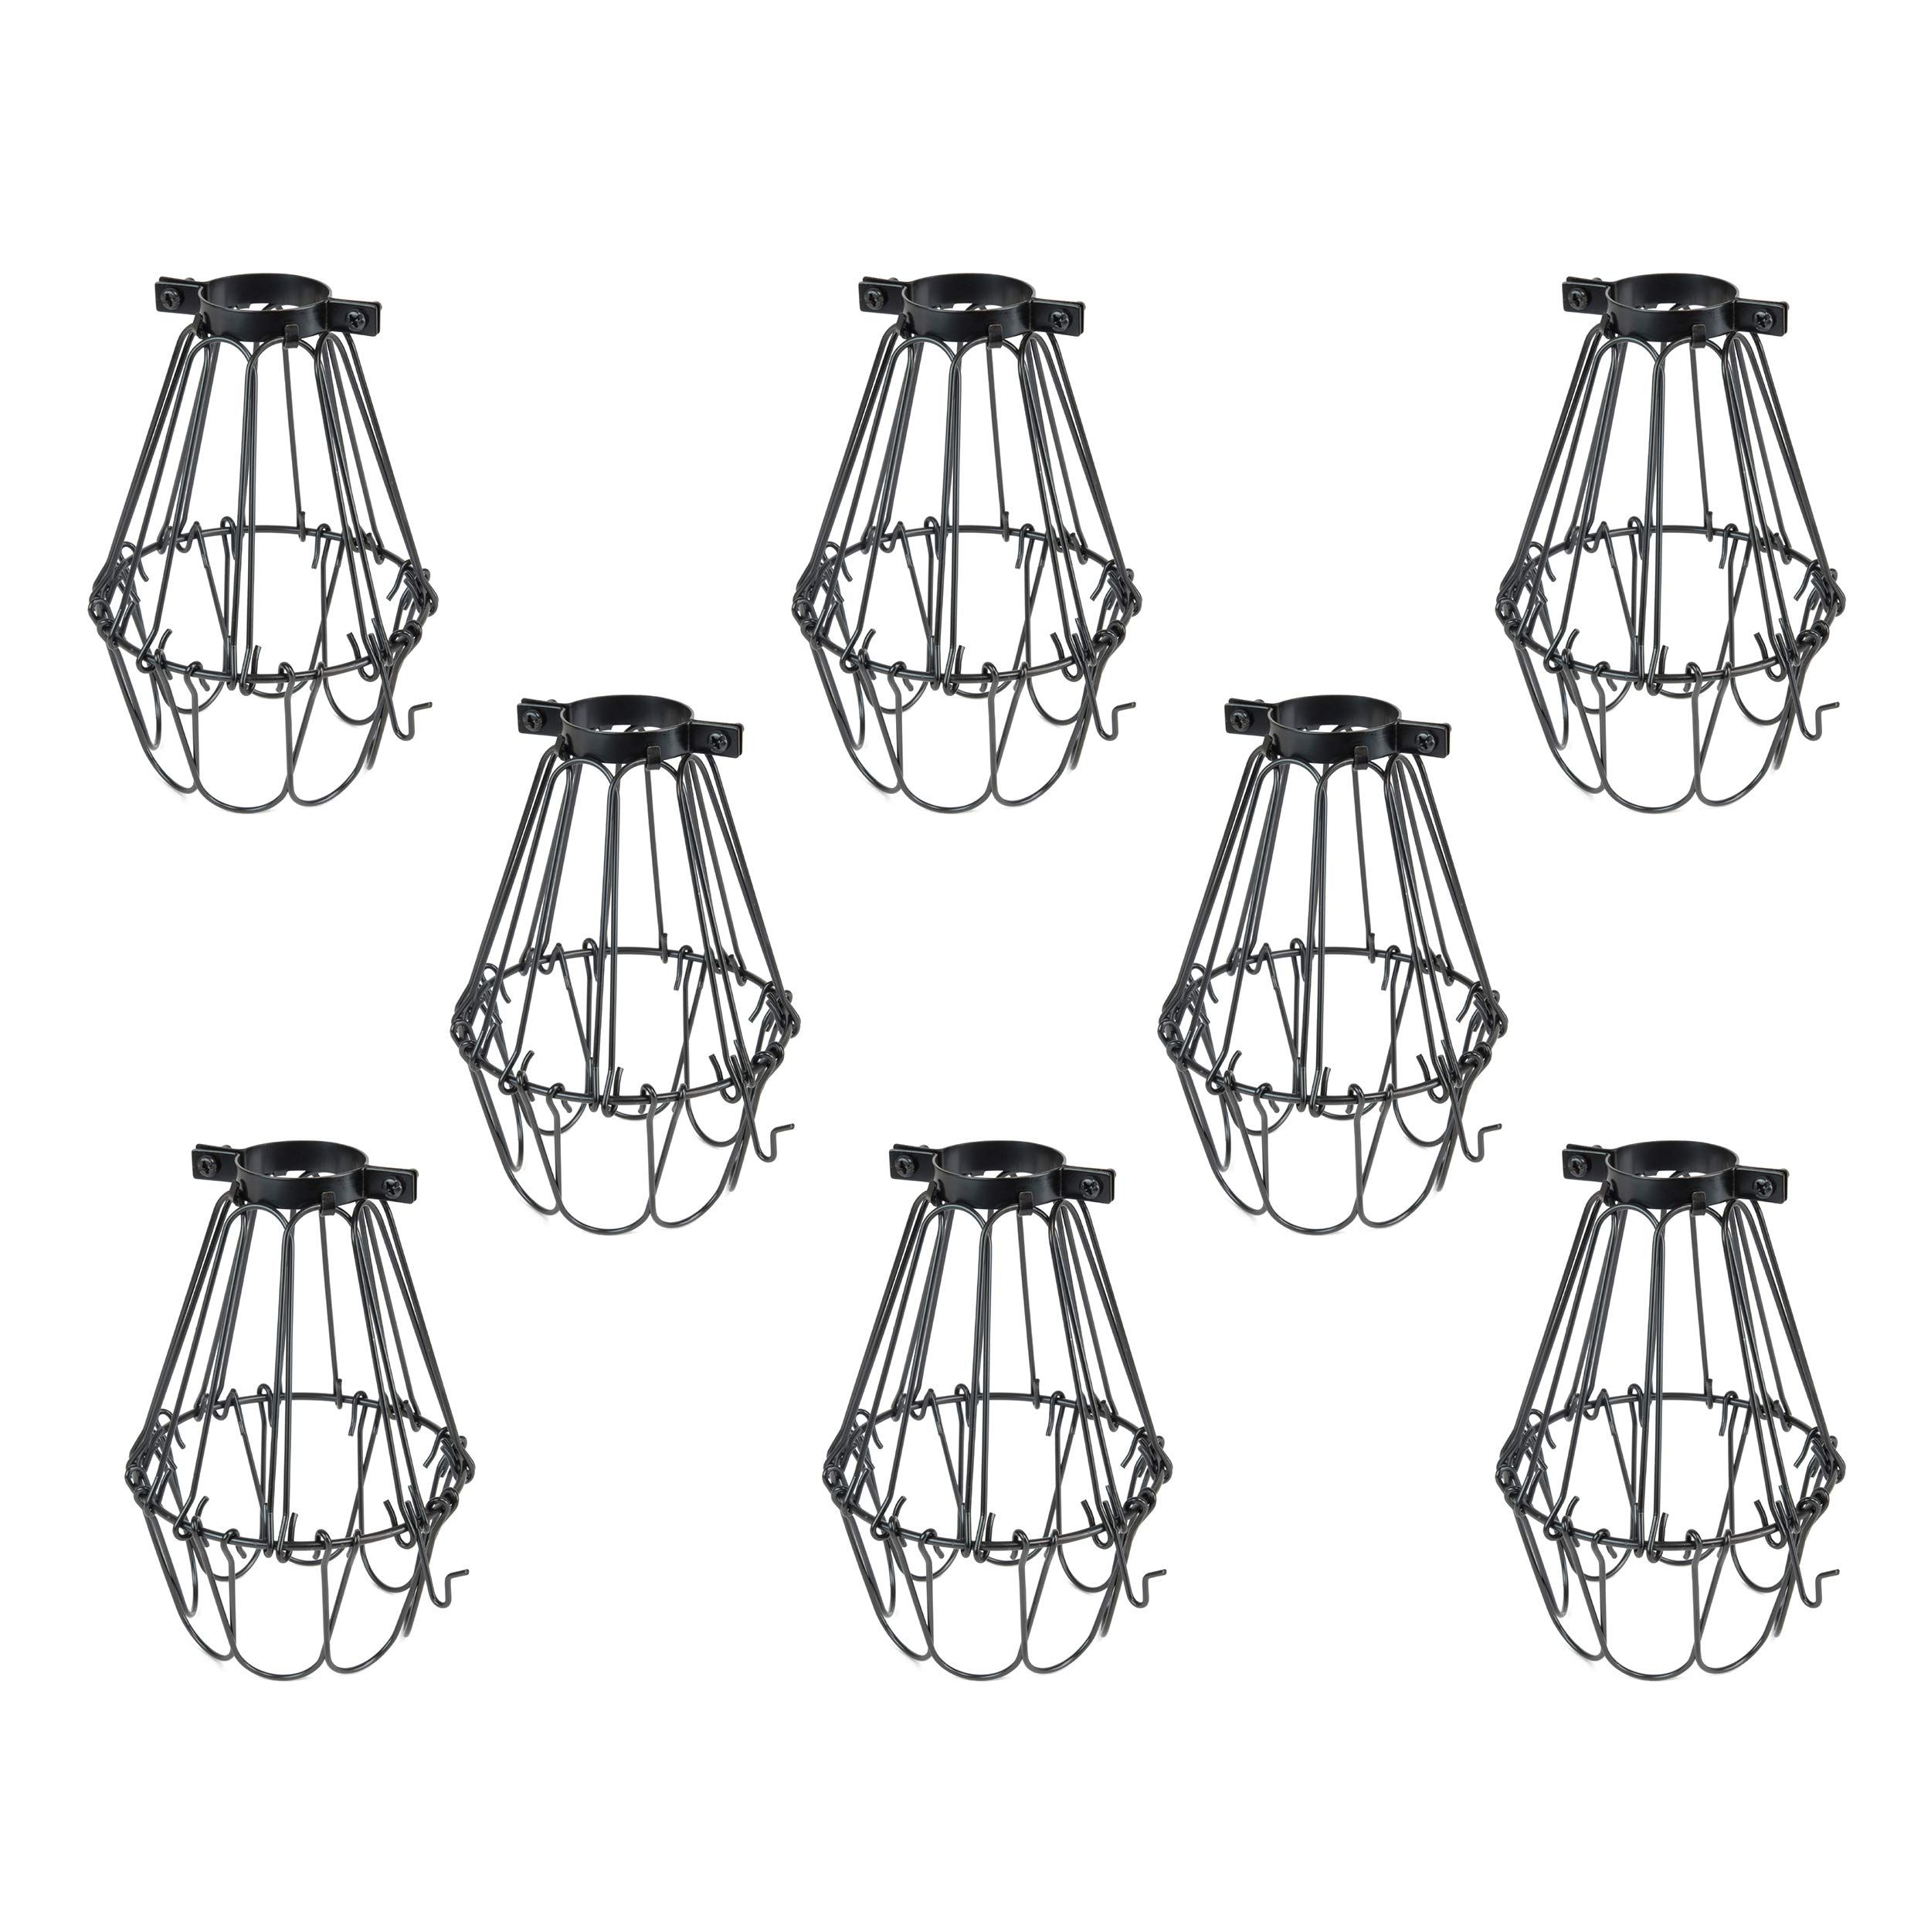 Rustic State Lampa Small Light Cage Metal Lamp Shade Black Set Of 8 In 2020 Metal Lamp Shade Metal Lamp Metal Lighting